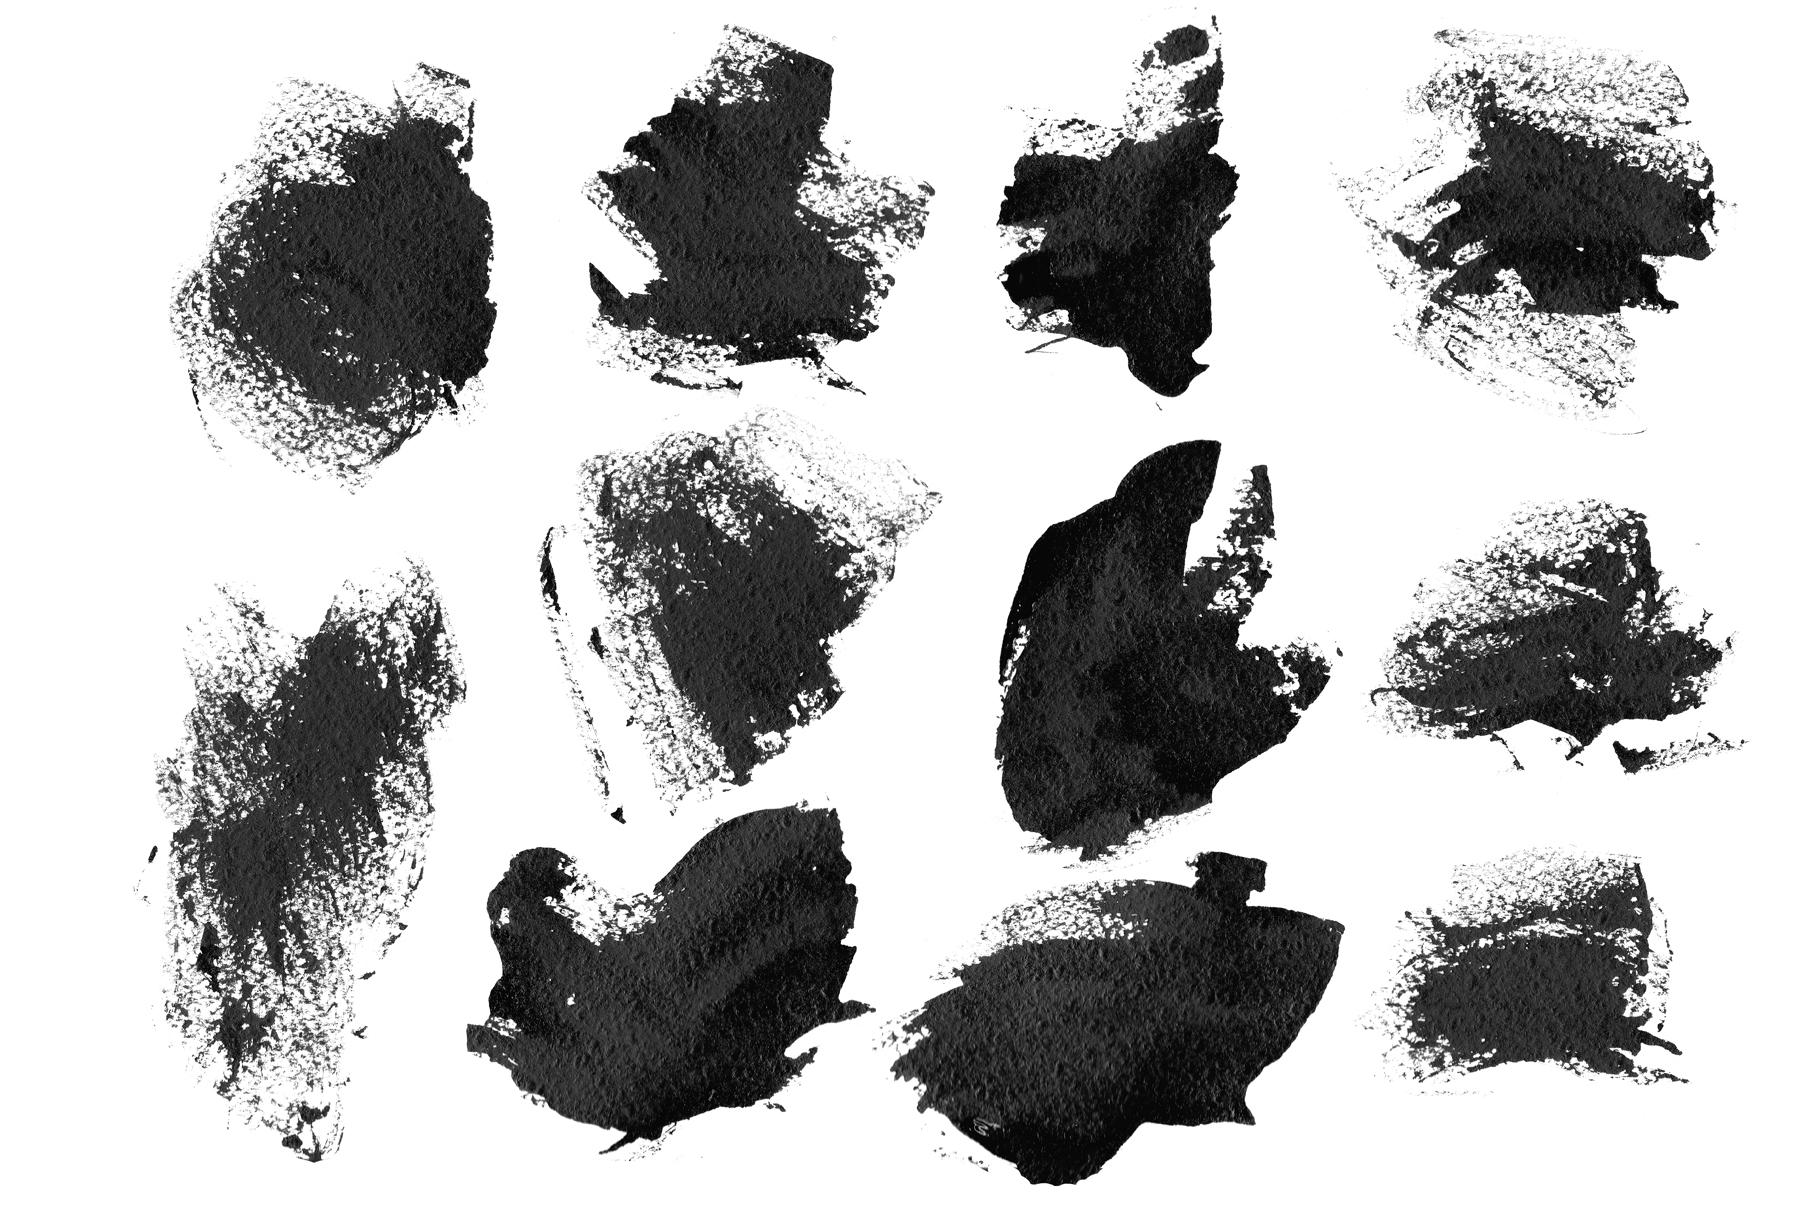 516 textures big set. example image 3